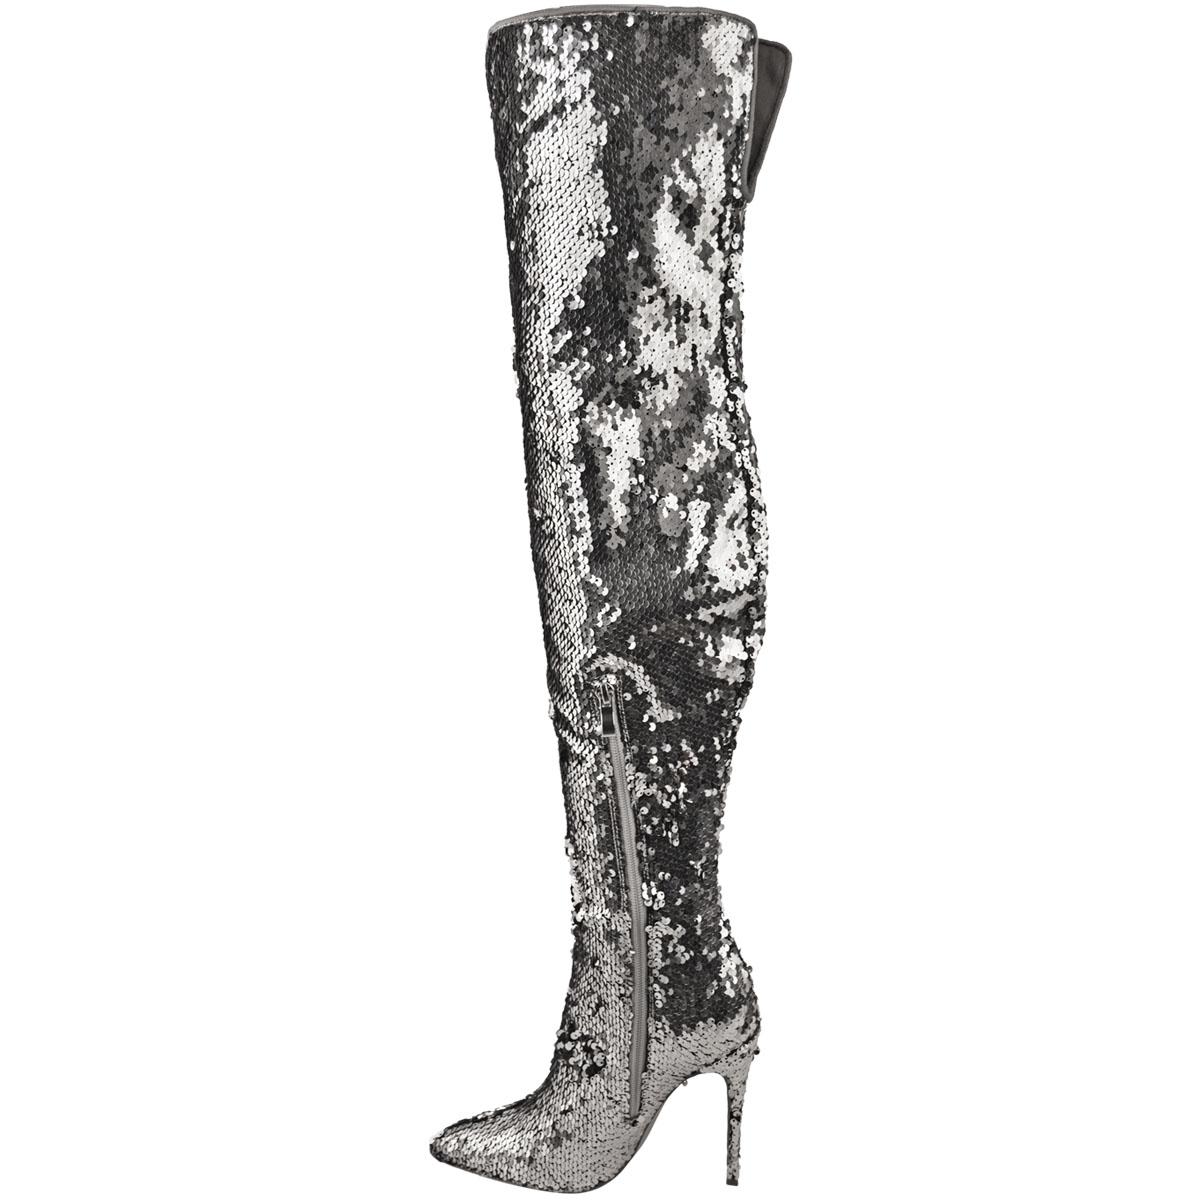 Party Metallic High The Details Womens Boots Zu Sparkle Knee Over Size Sequin Heels Ladies Nn08Ovmw